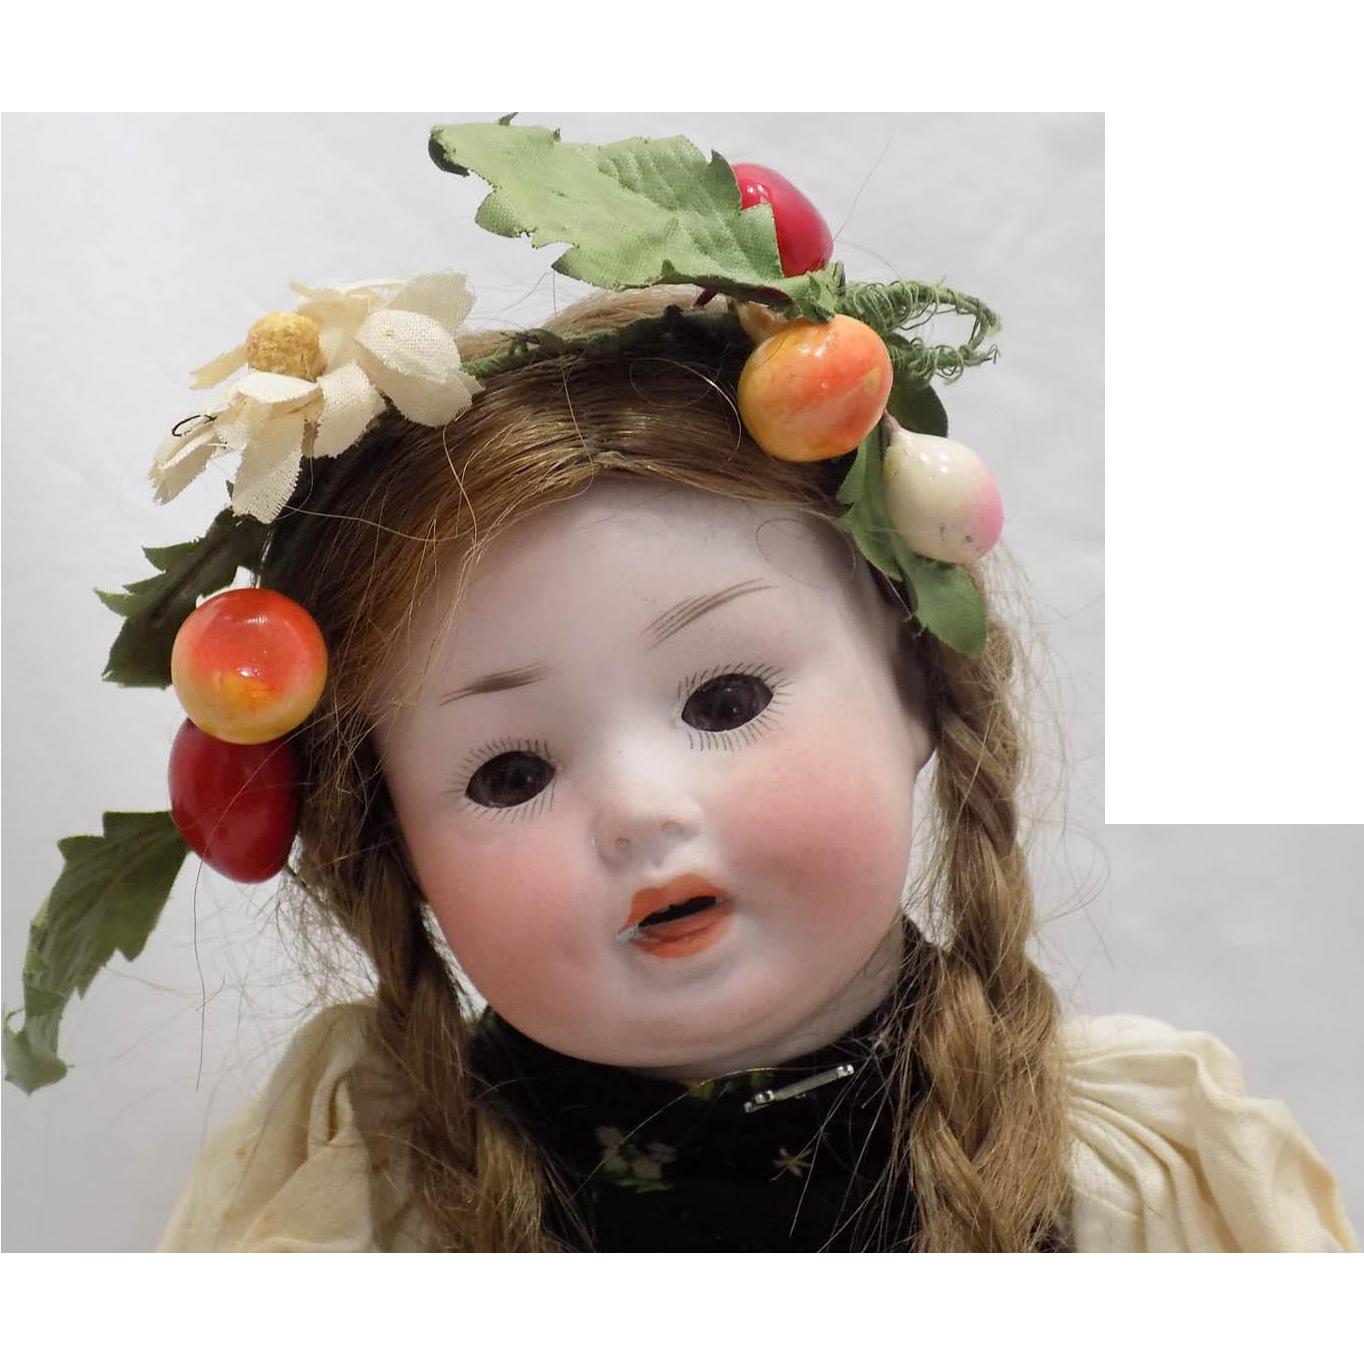 Antique German PM Porzellanfabrik Mengersgereuth Toddler Baby Doll Original Clothes